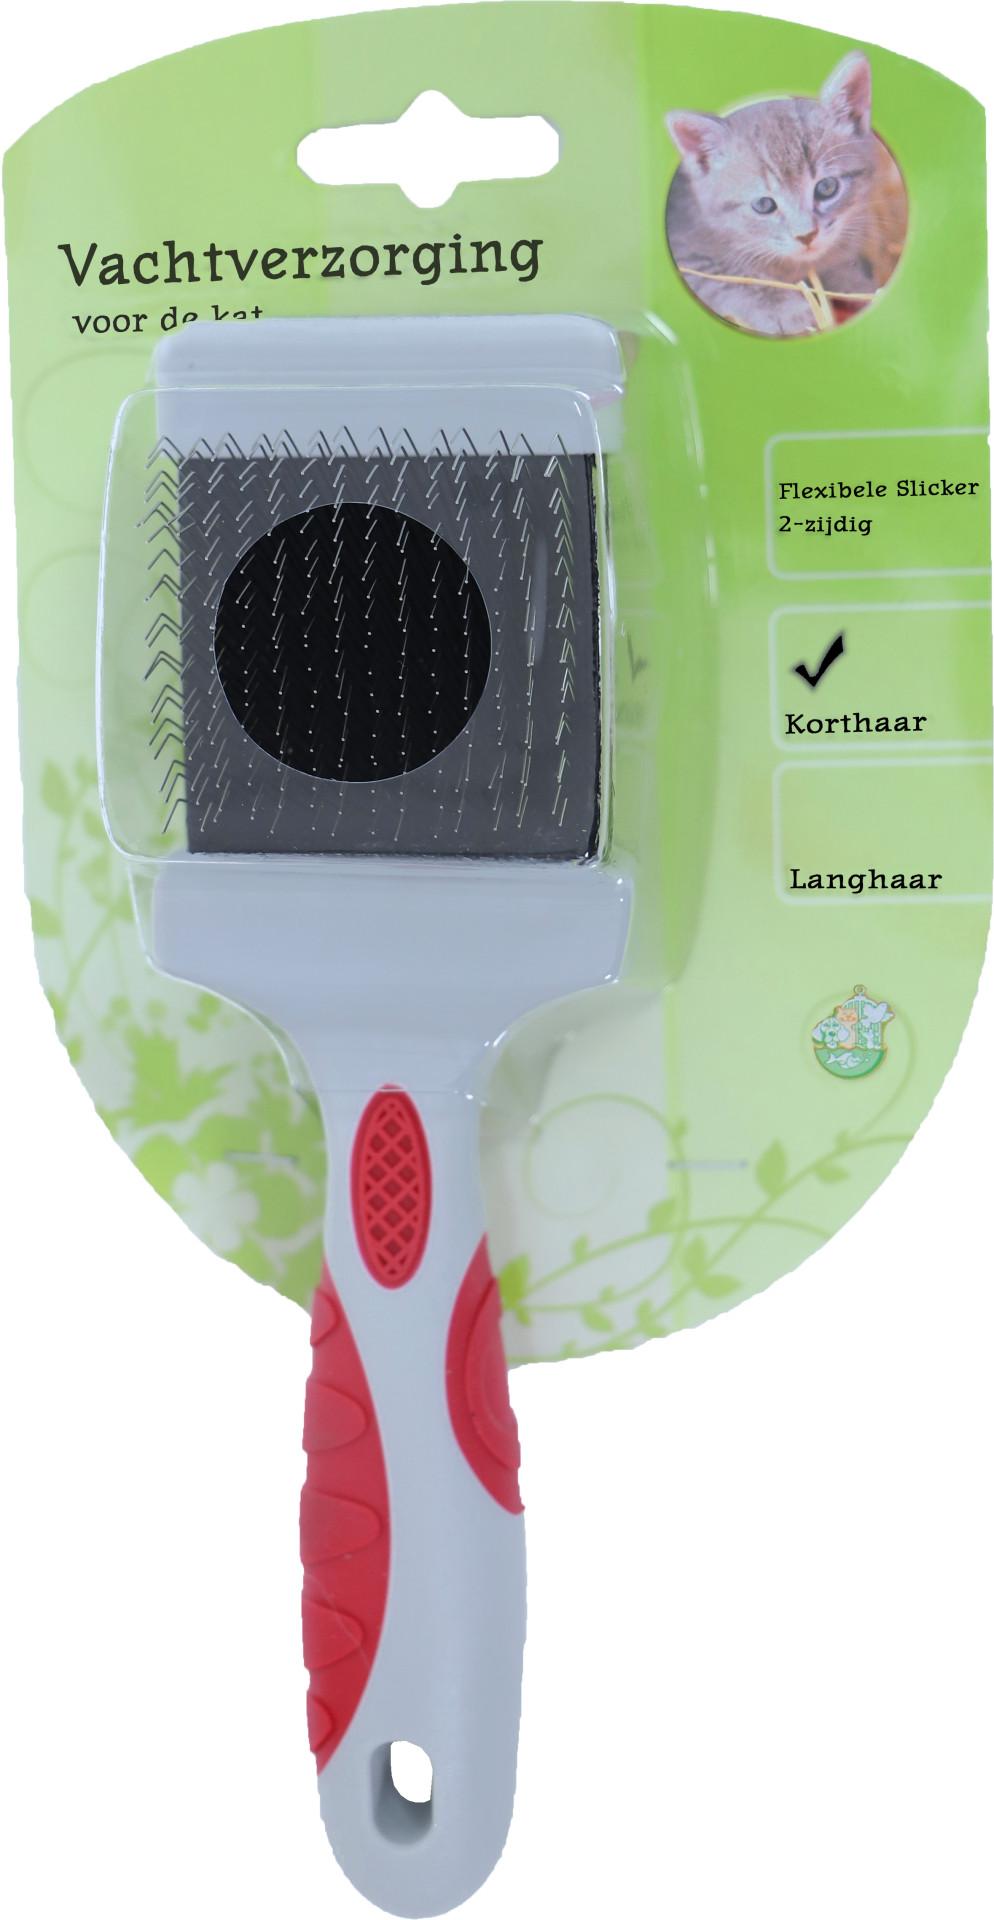 Borstel Flexibele Slicker Small